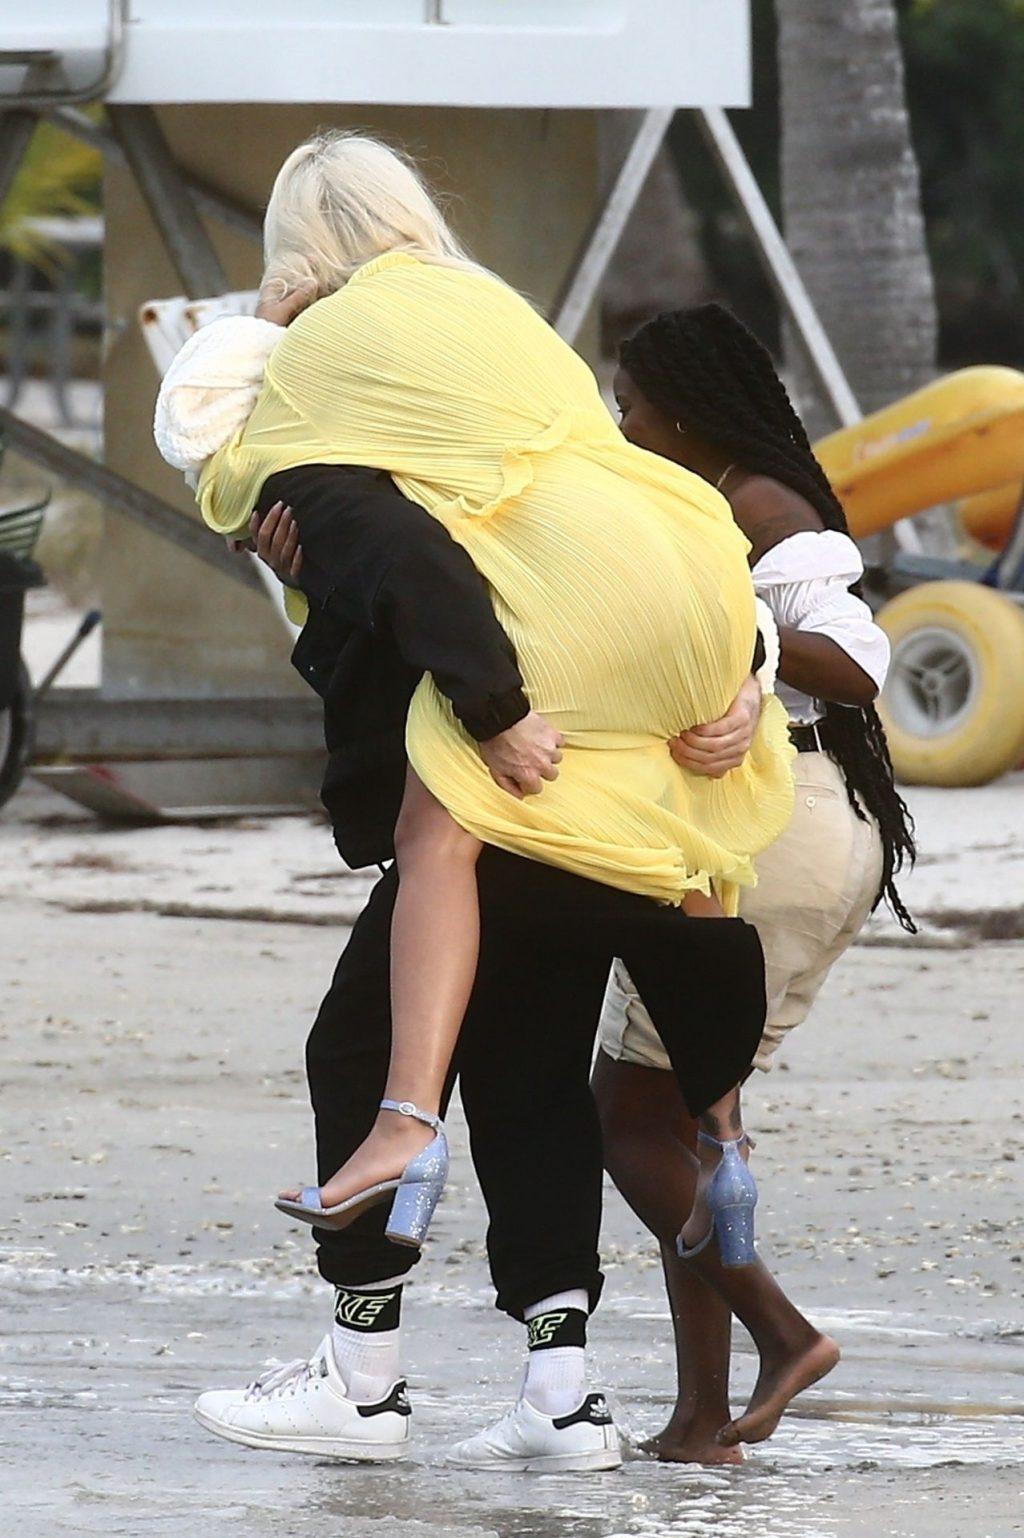 Rita Ora Upskirt (29 New Photos)